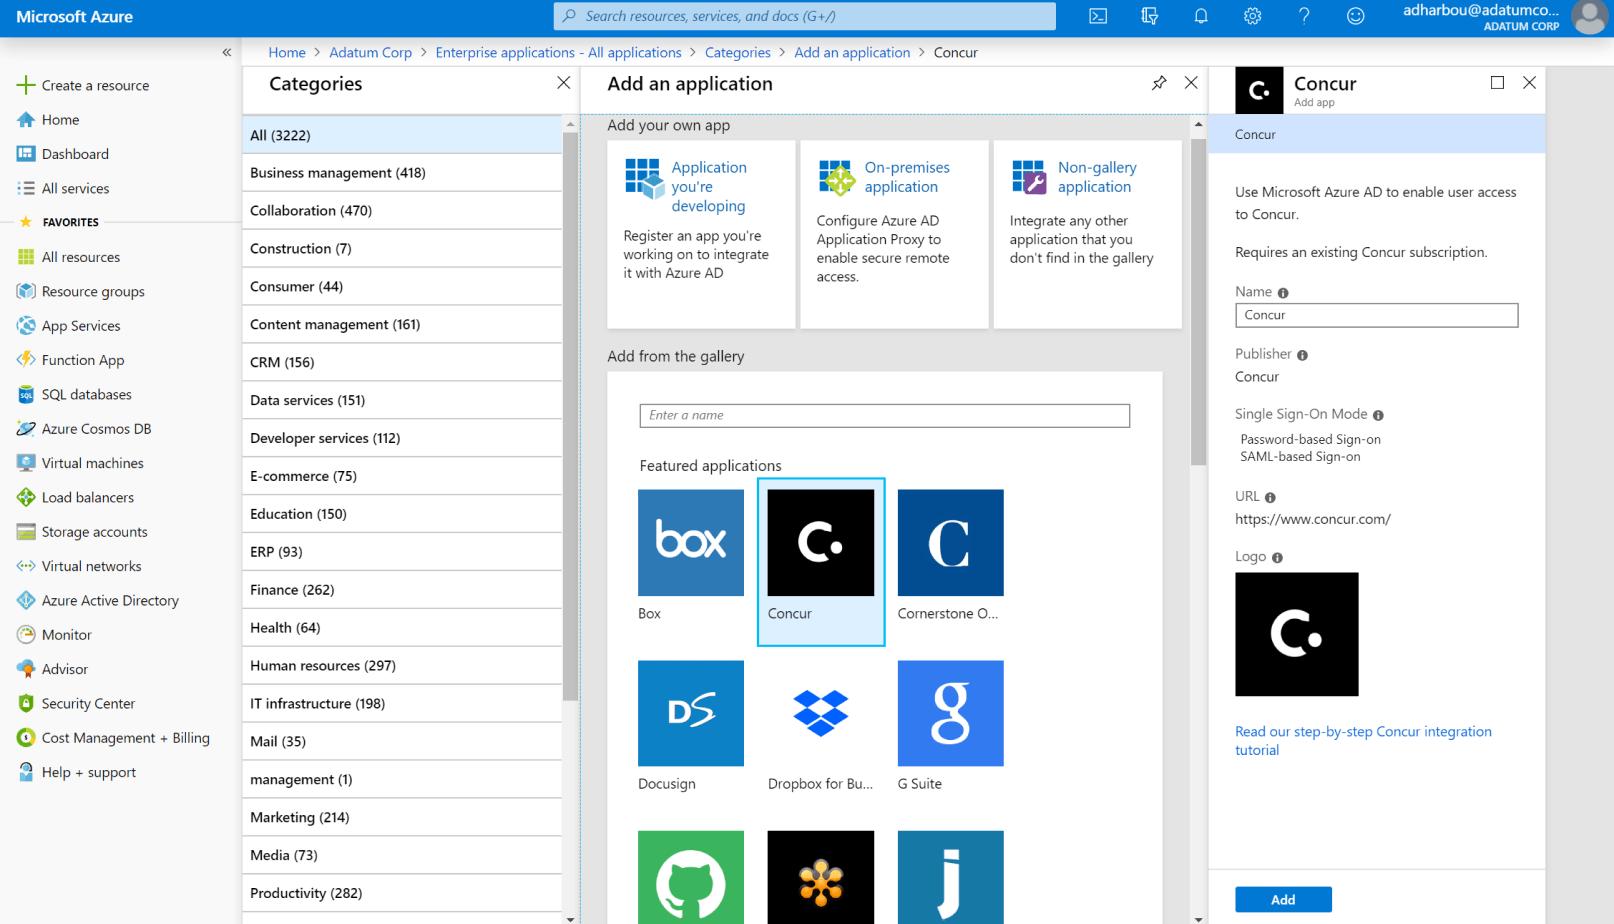 Azure Active Directory license key